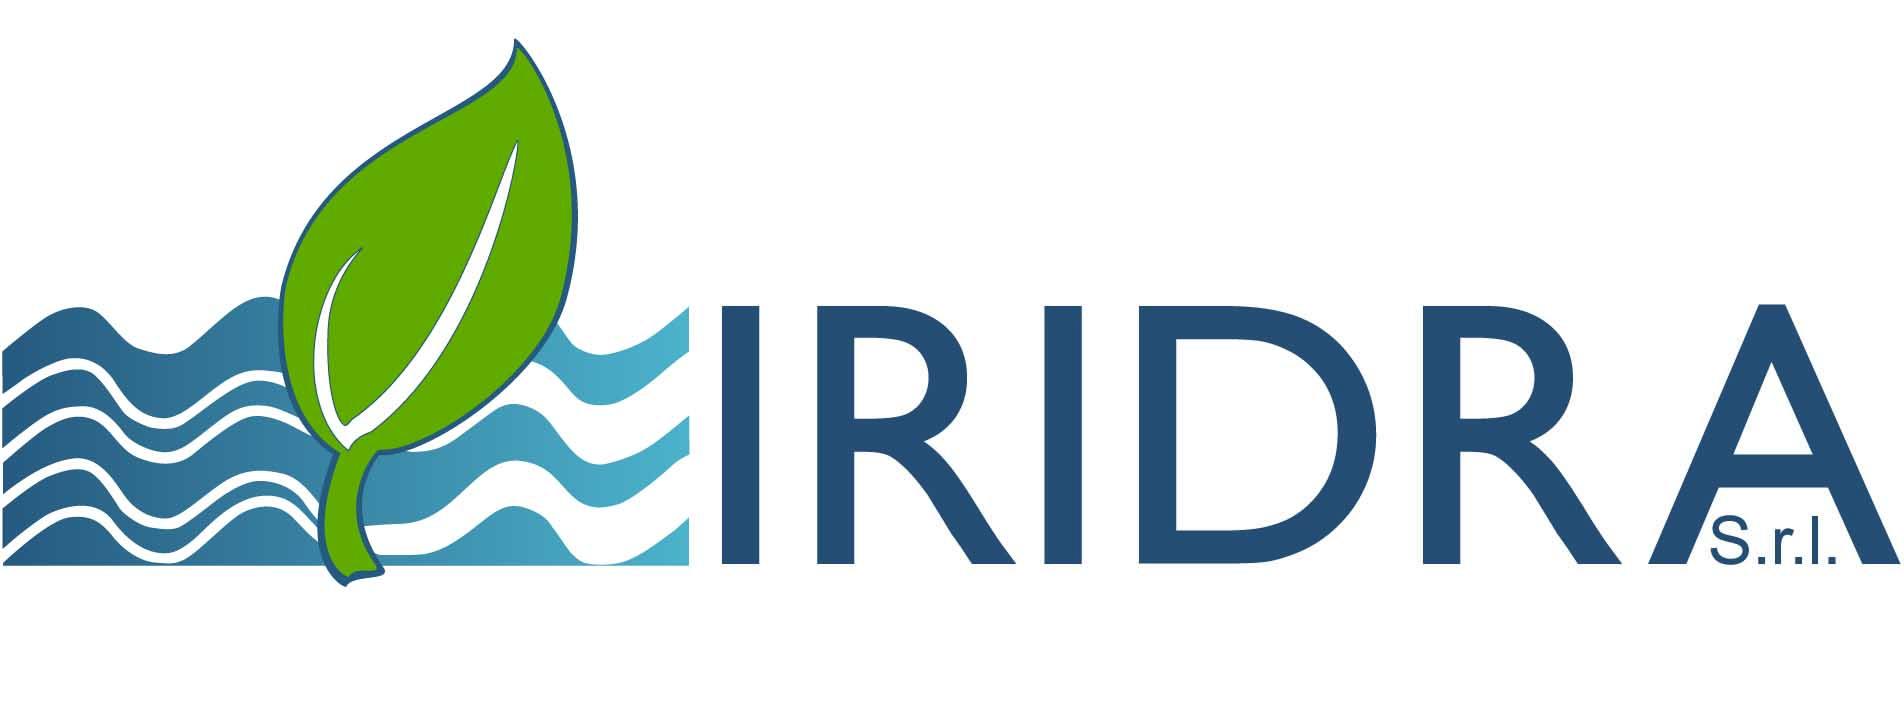 Iridra srl